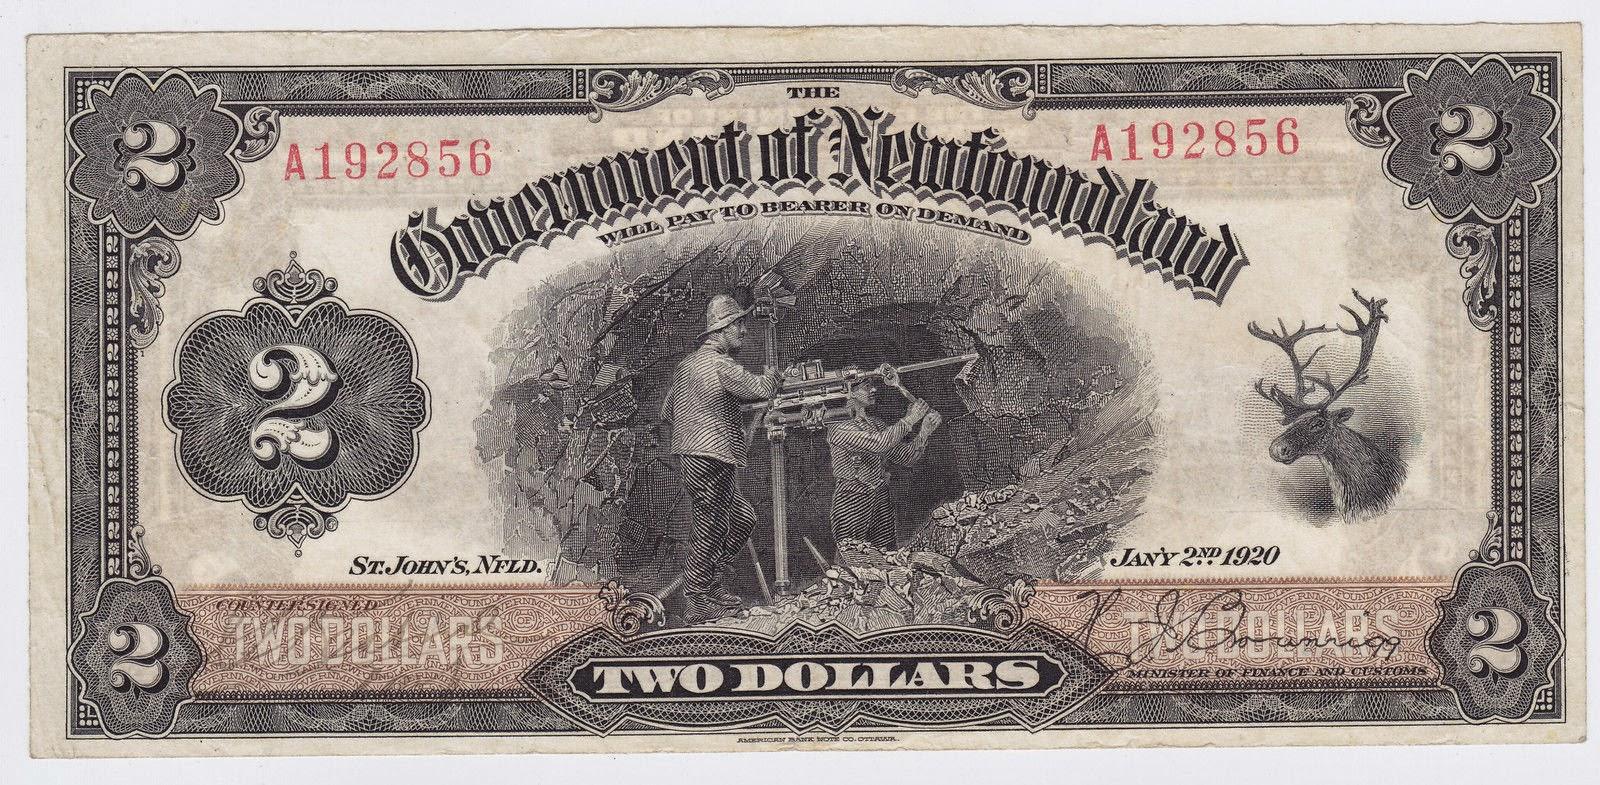 Newfoundland banknotes 2 Dollar Bill